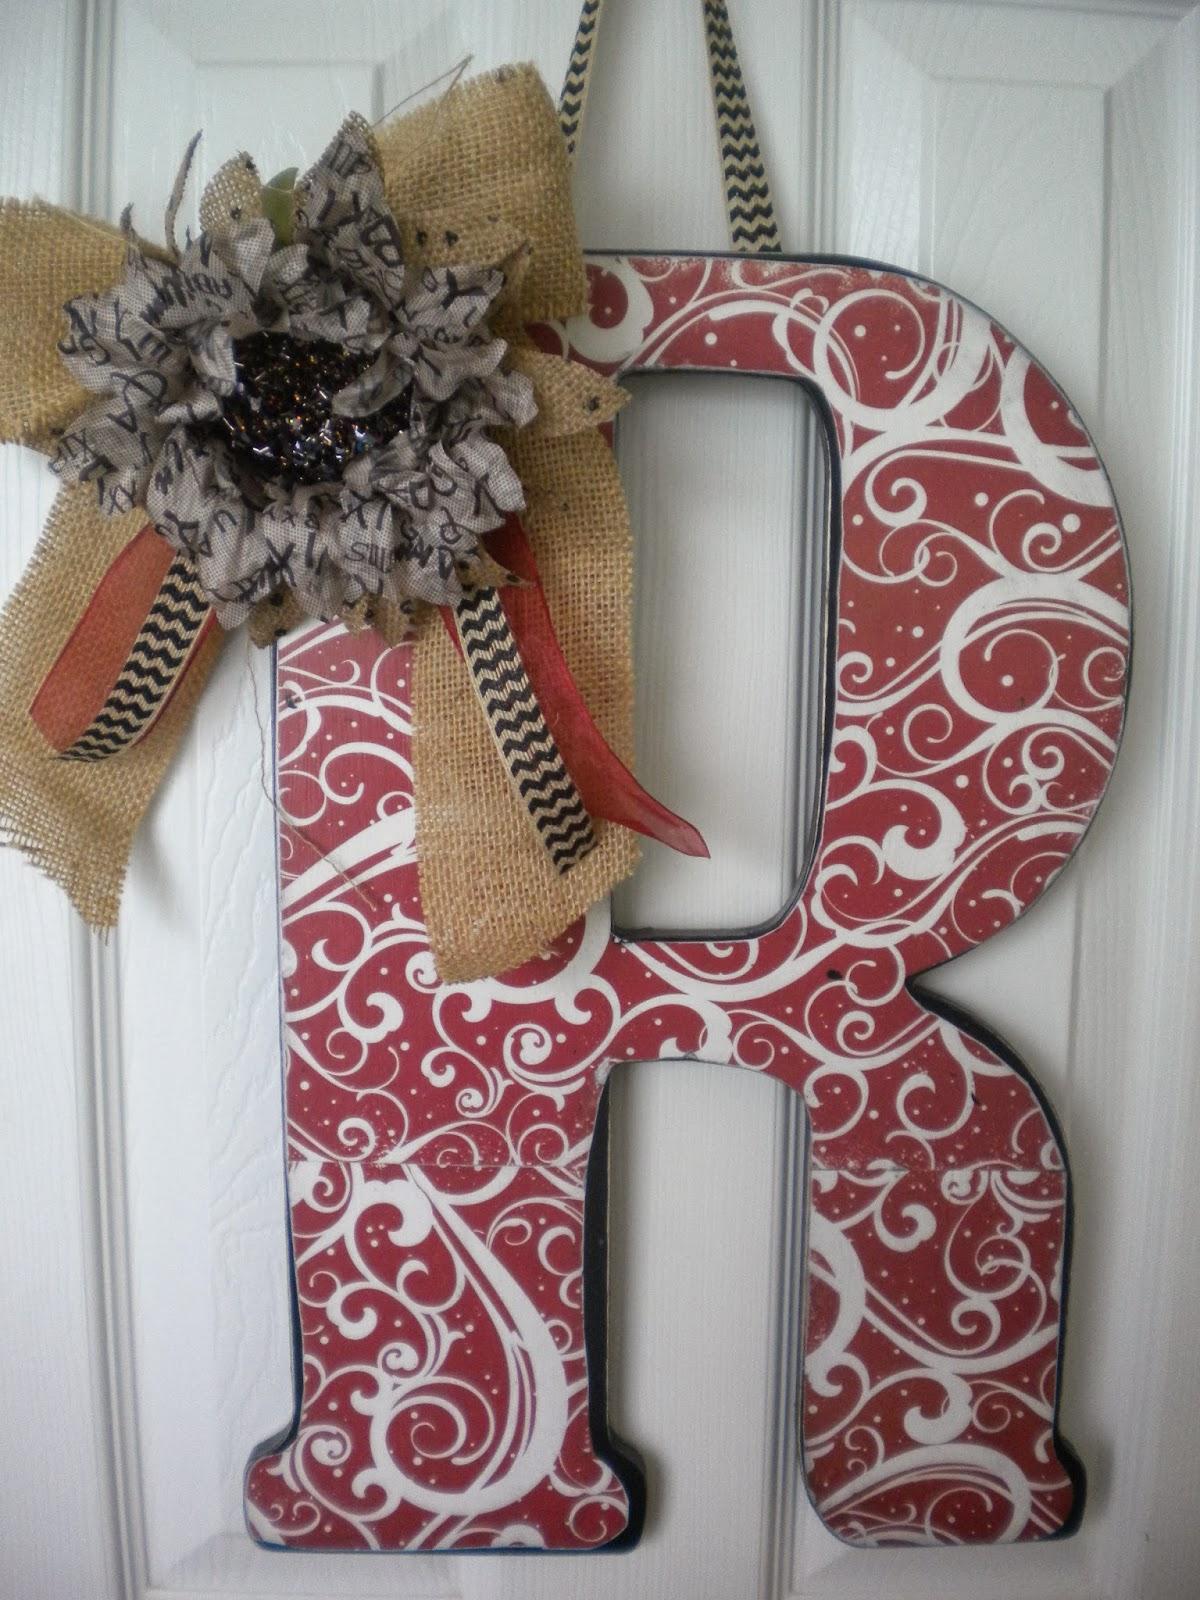 http://www.daisiesandstars.com/2013/10/decorative-wall-letters.html